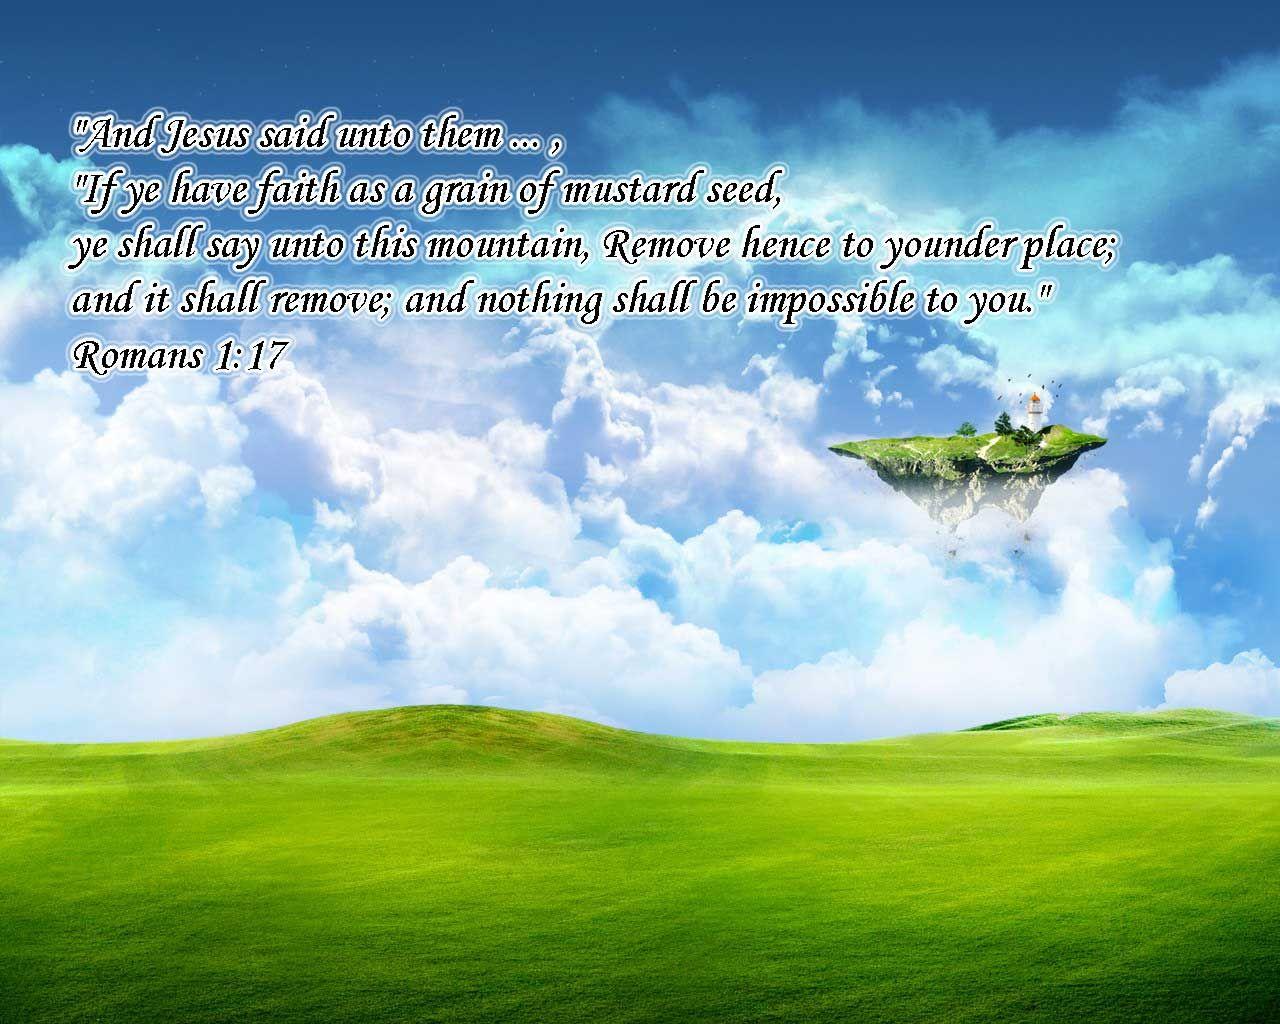 Wonderful Wallpaper Horse Bible Verse - d90756f340e5f44af653777e1940eb69  Trends_16398.jpg